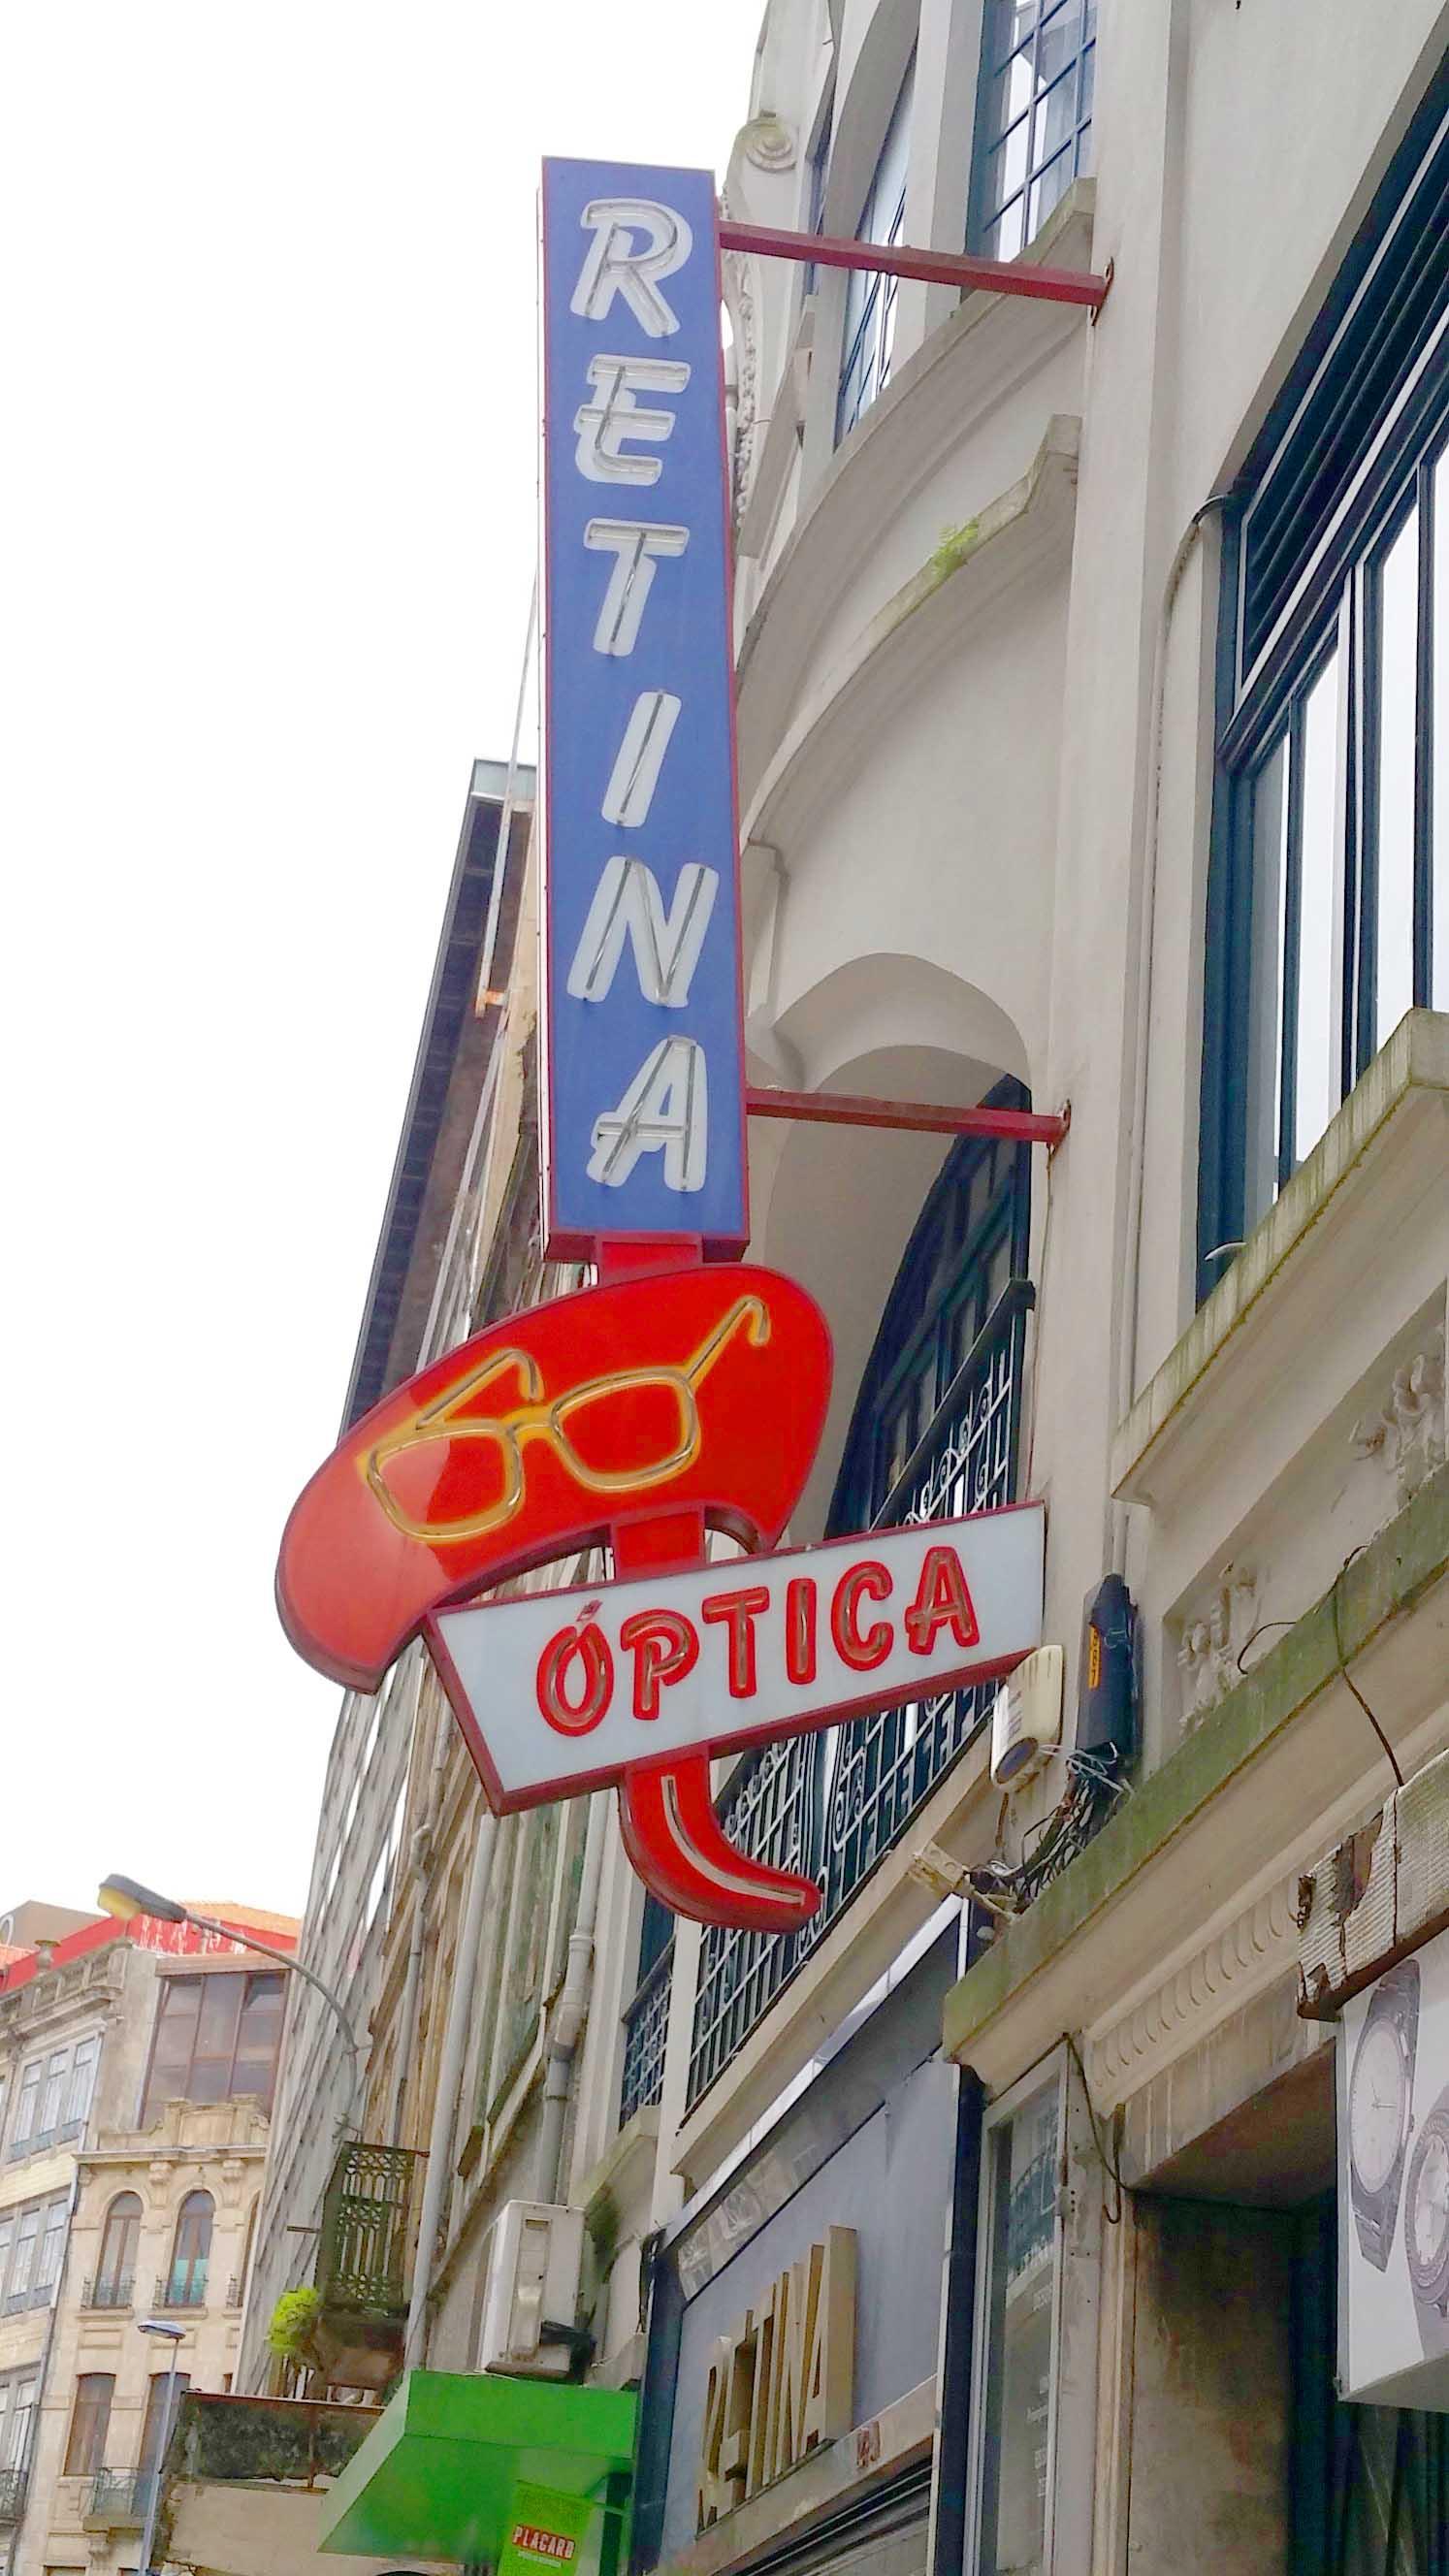 <strong>Oporto turismo</strong>